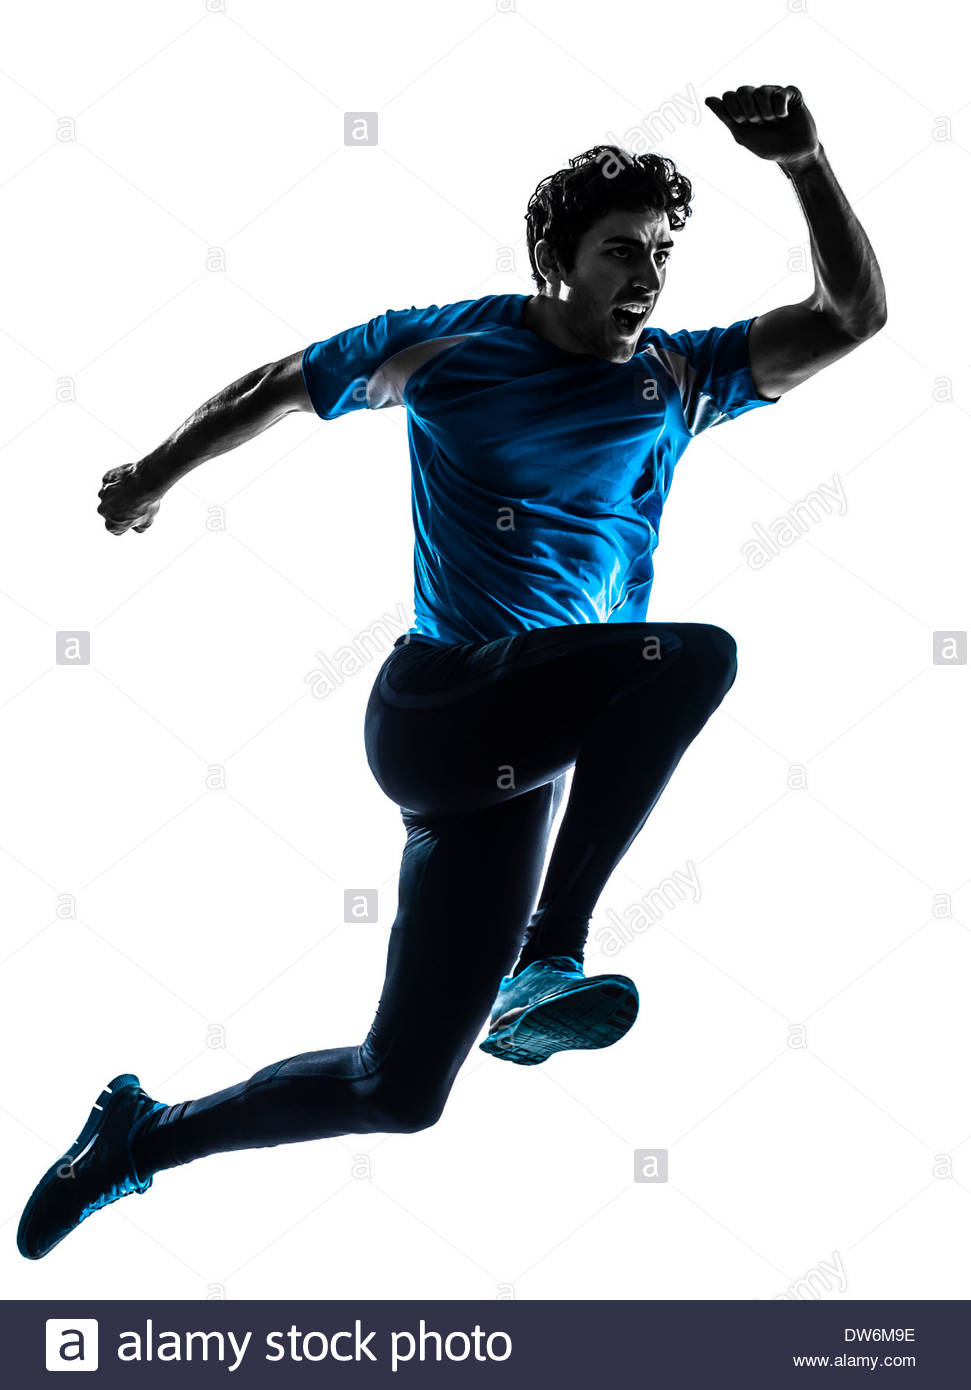 971x1390 One Man Running Sprinting Jogging Shouting In Silhouette Studio